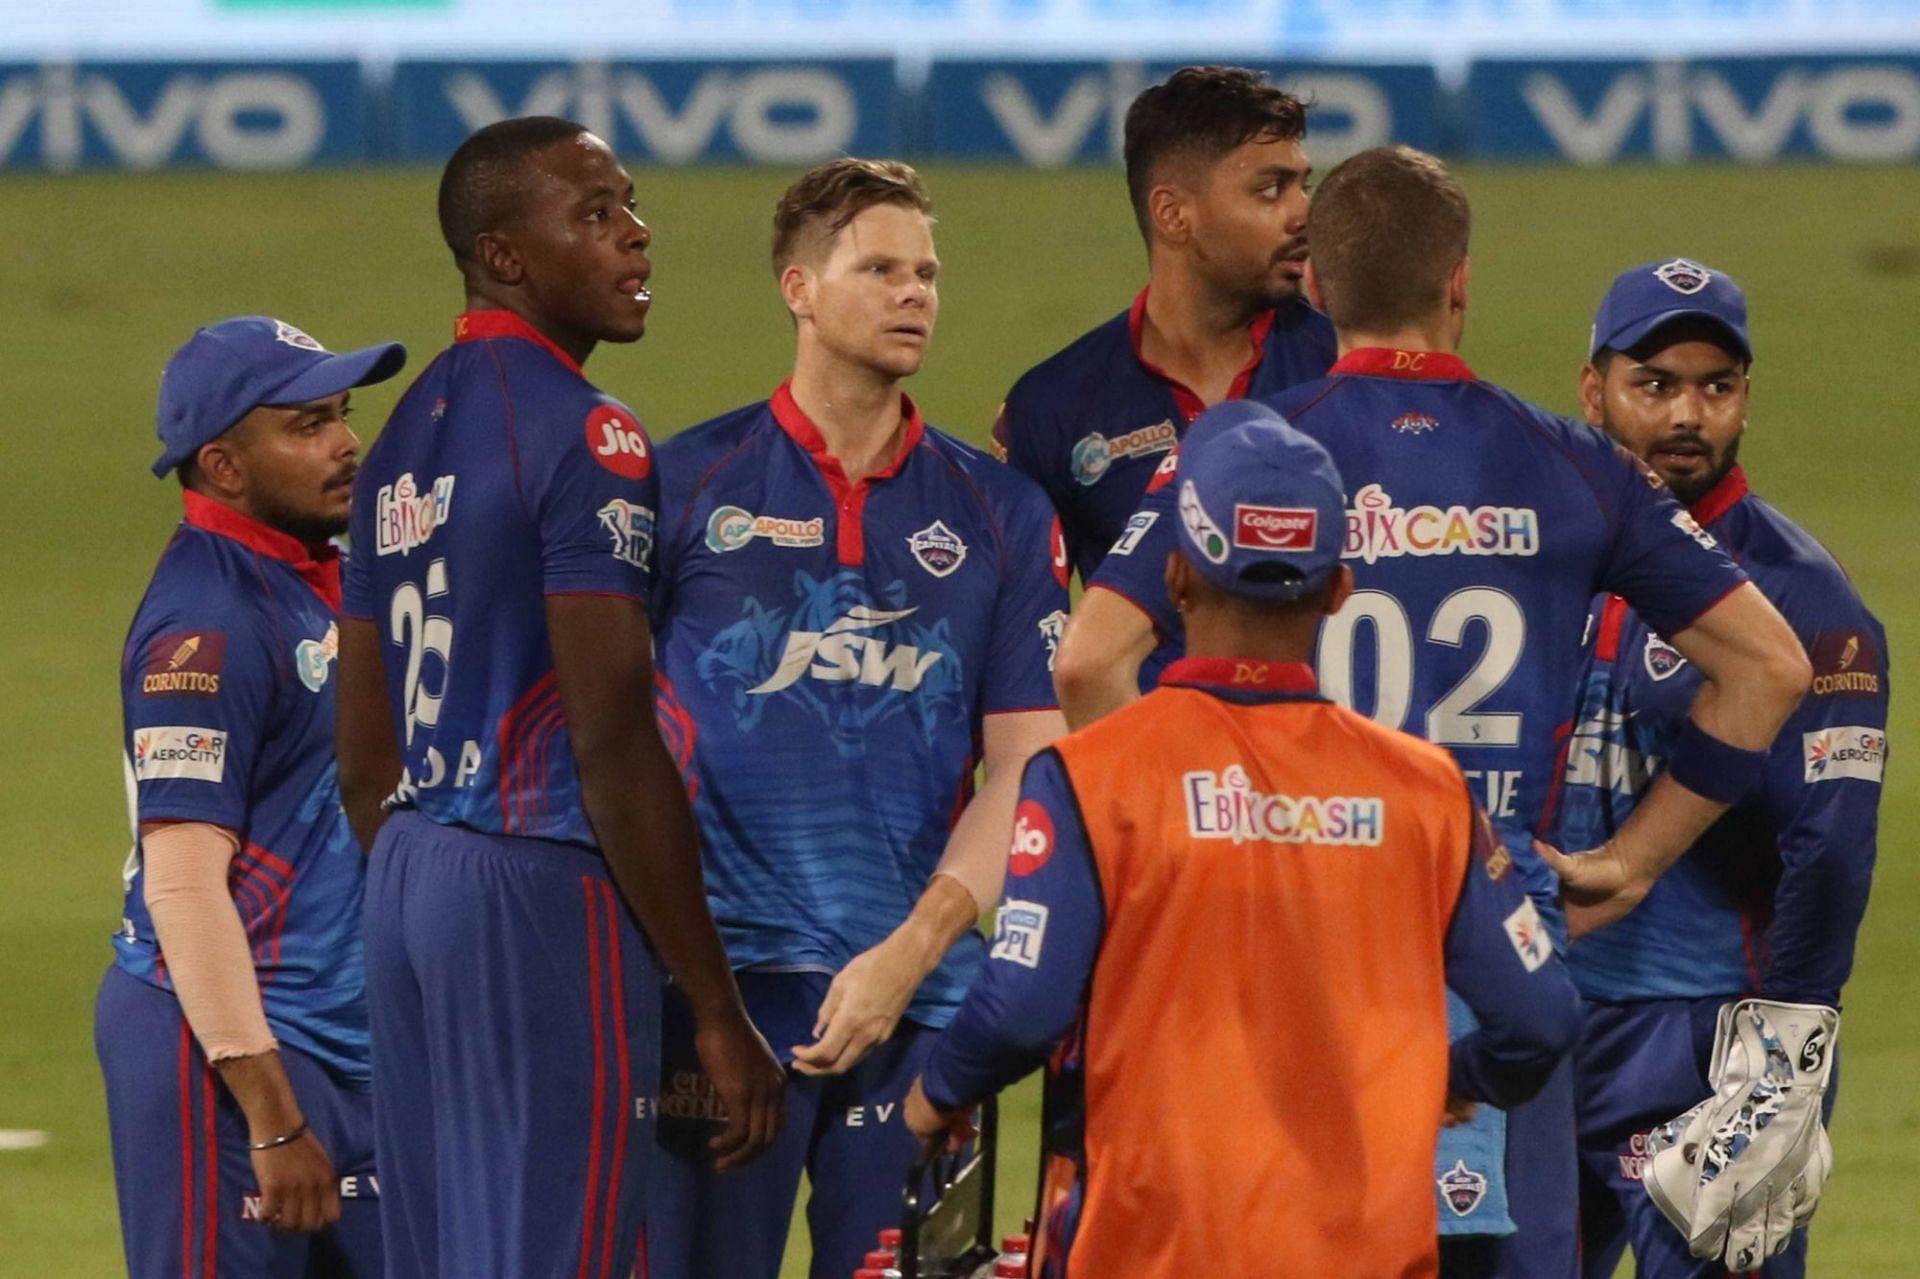 Delhi Capitals were dumped out of the IPL by KKR (Pic Credits: IPLT20.com)